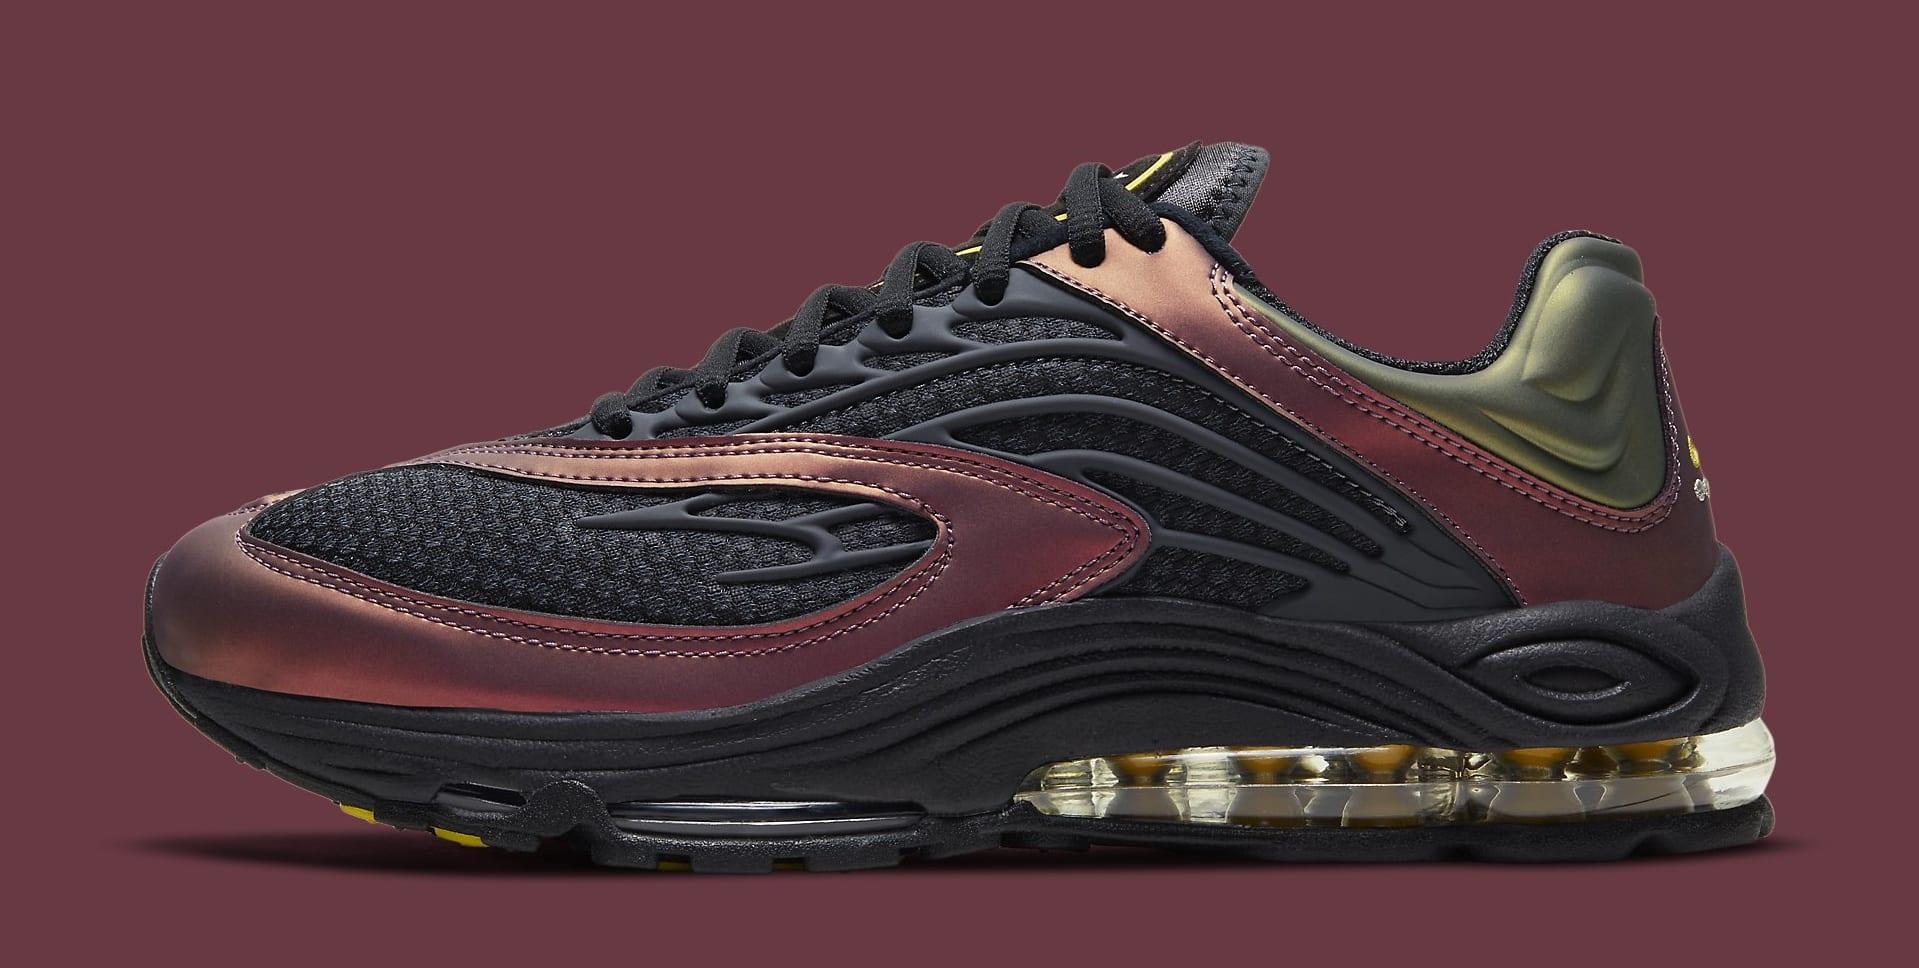 Nike Air Tuned Max Black/Celery/Dark Charcoal CV6984-001 Lateral